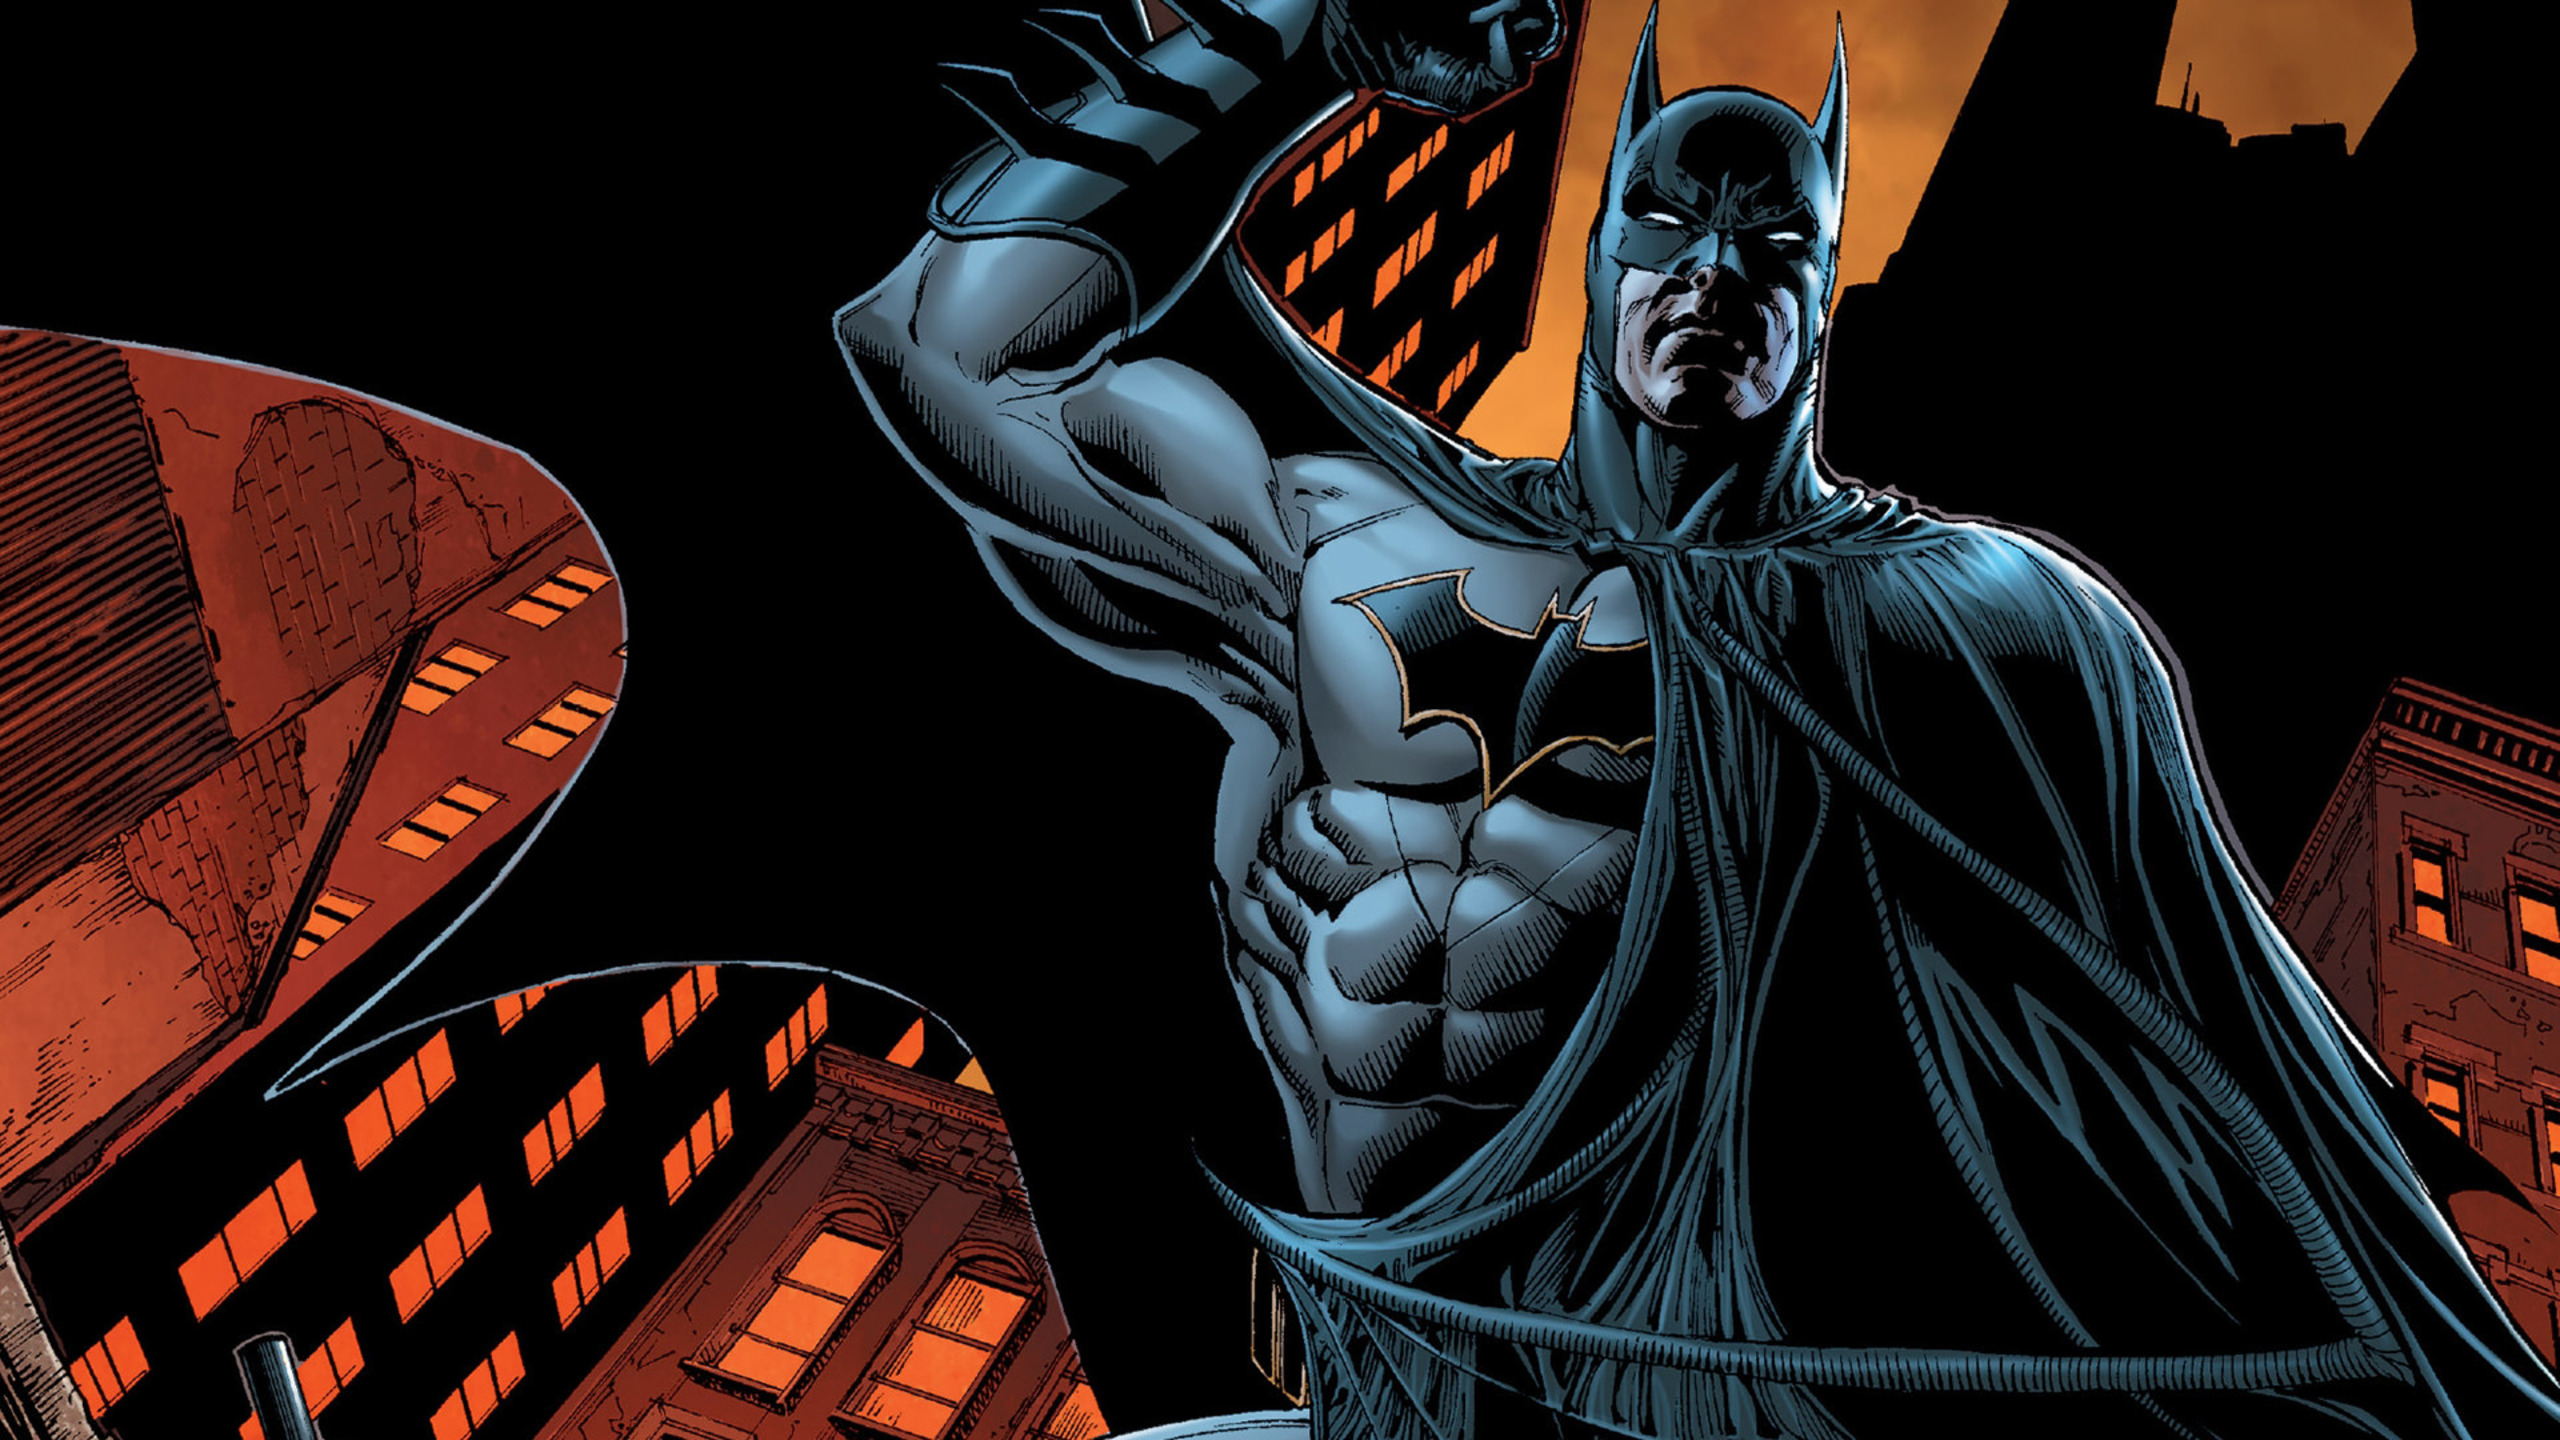 2560x1440 batman comic artwork 1440p resolution hd 4k wallpapers